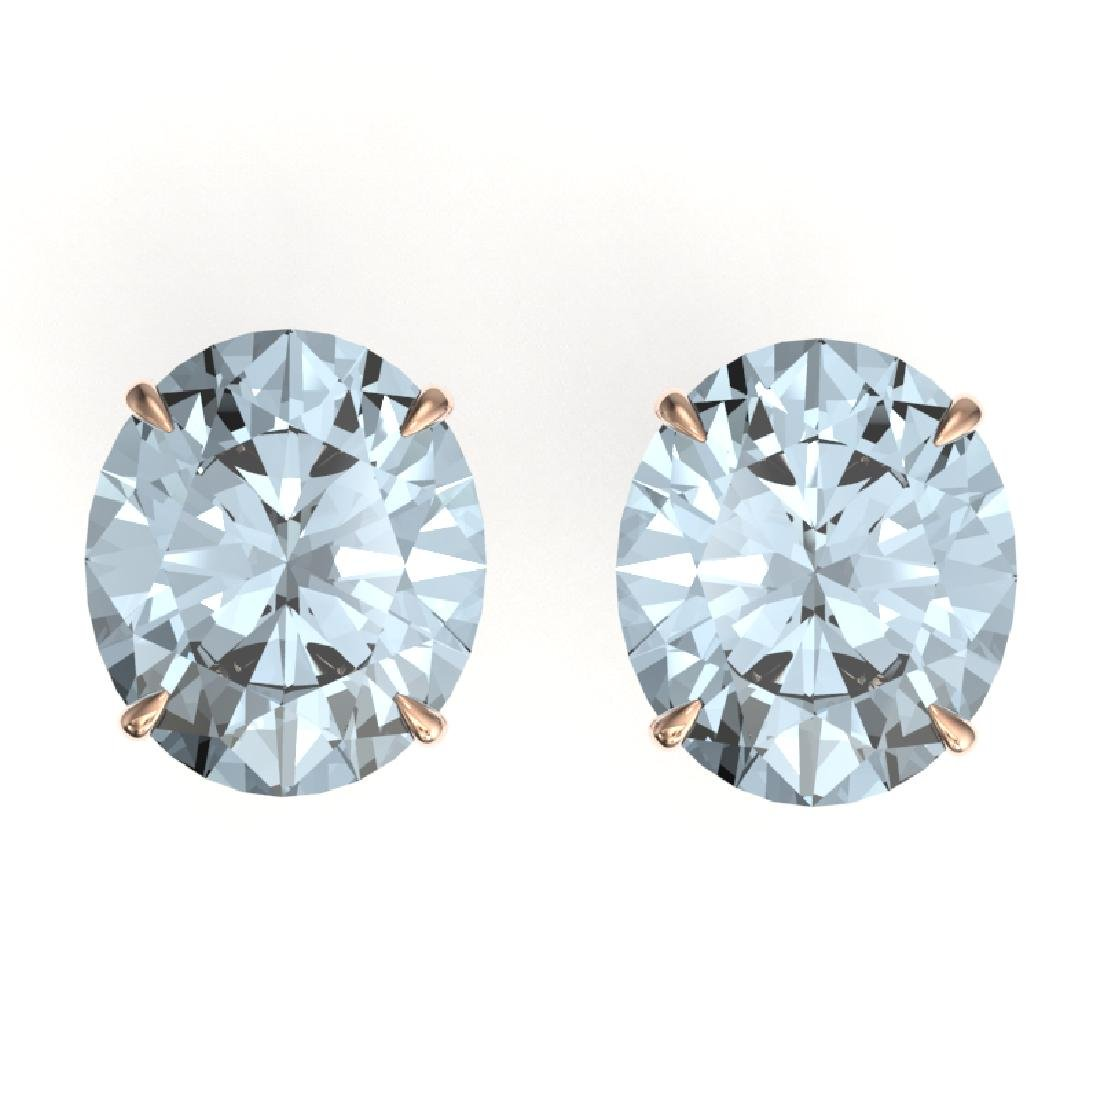 18 CTW Sky Blue Topaz Designer Solitaire Stud Earrings